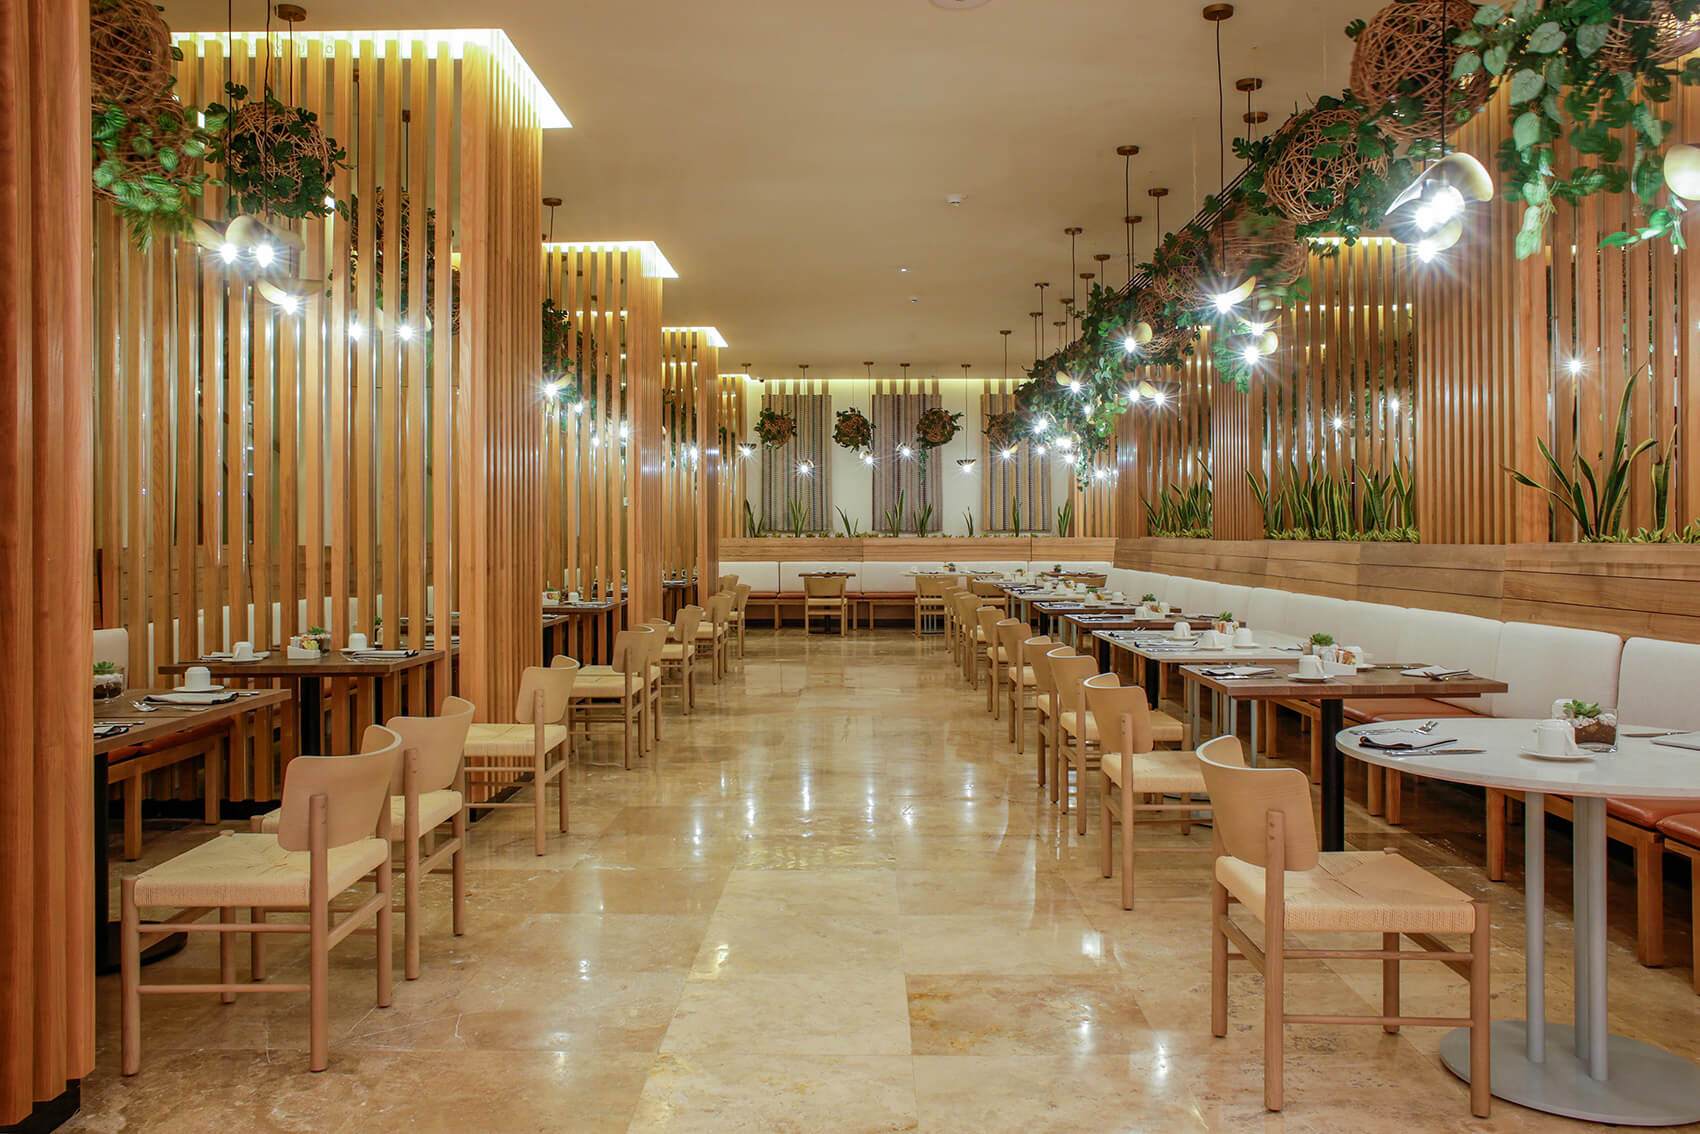 Paradisus by Meliá Announces Malva Food Bazar as Newest Food Concept at Paradisus Cancun